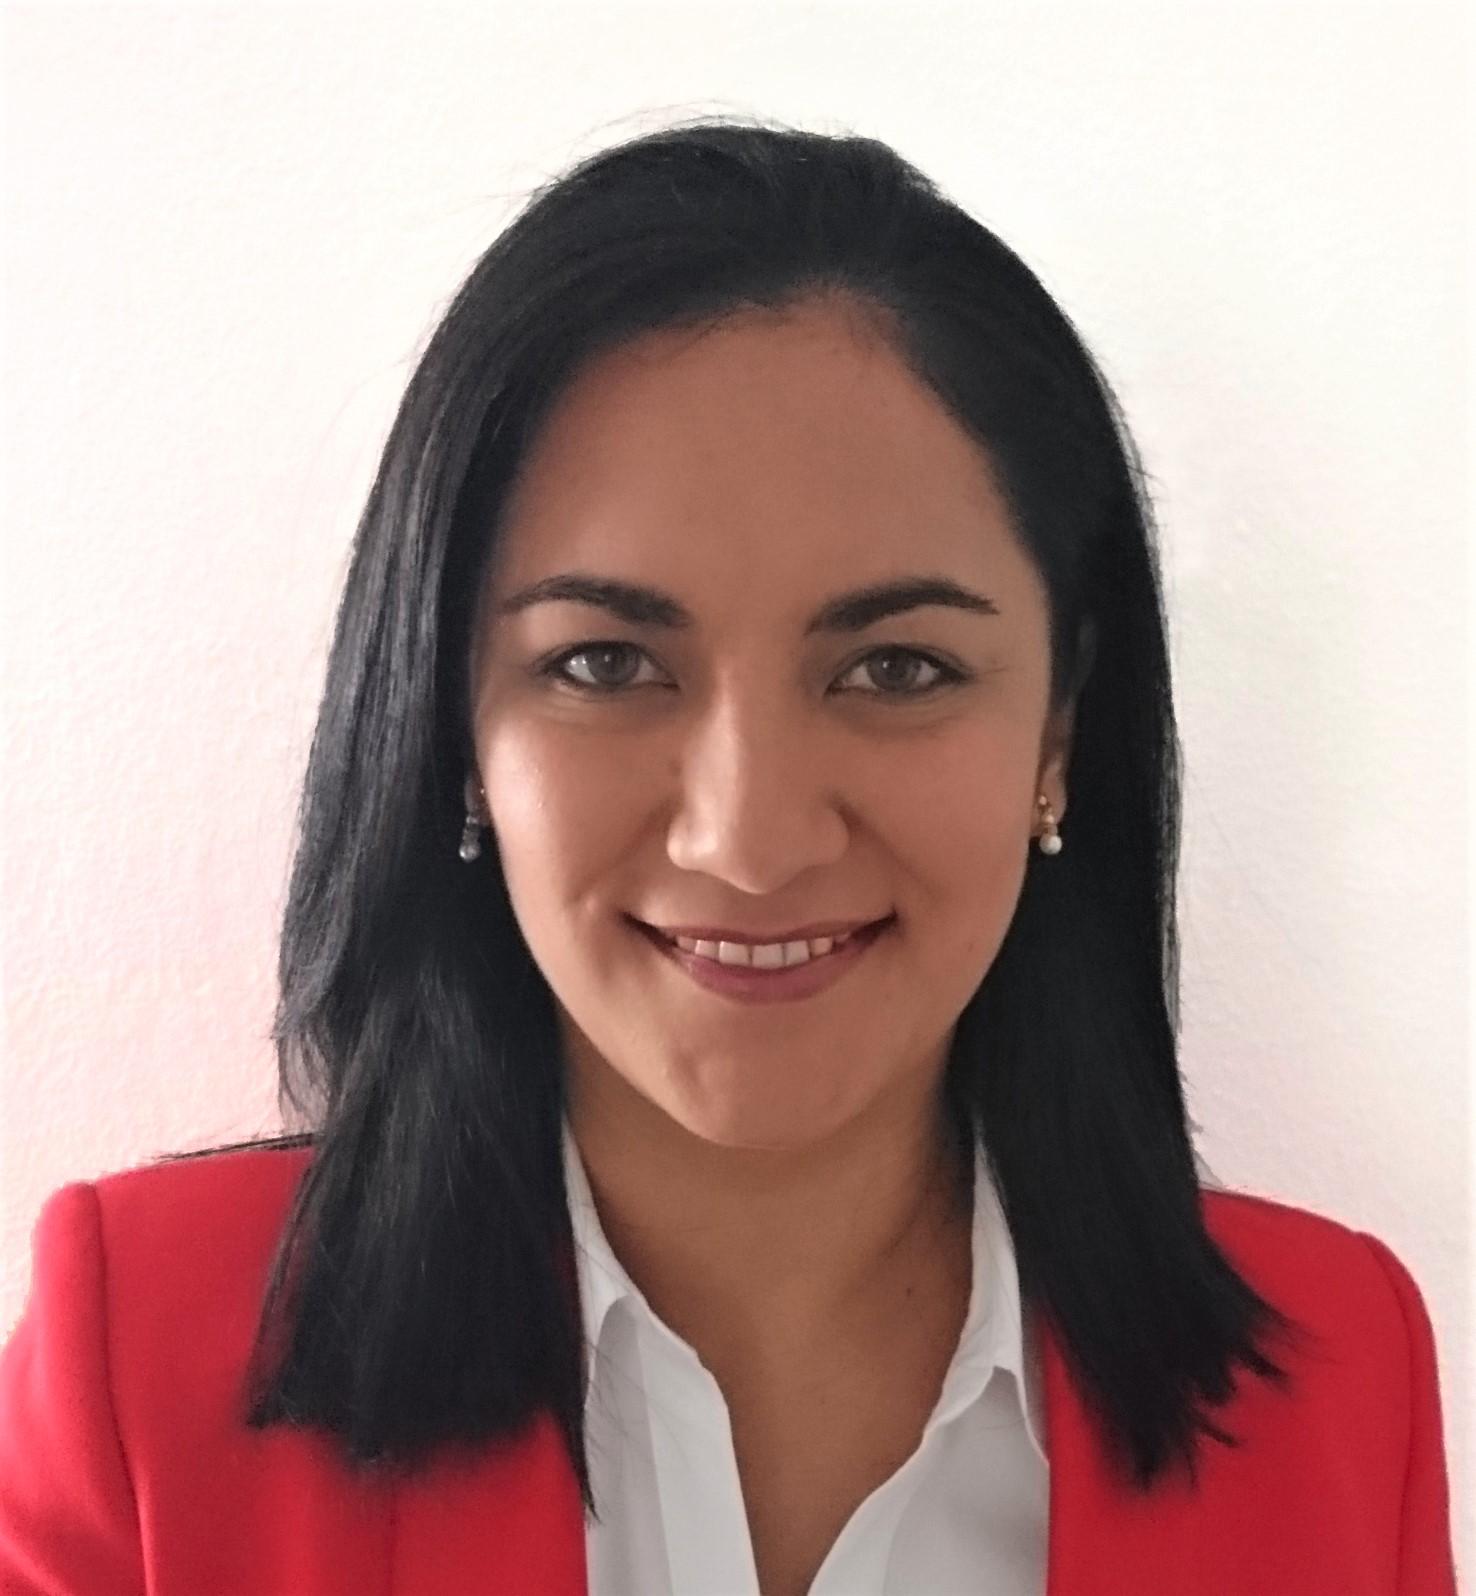 Bedilia Estrada profile